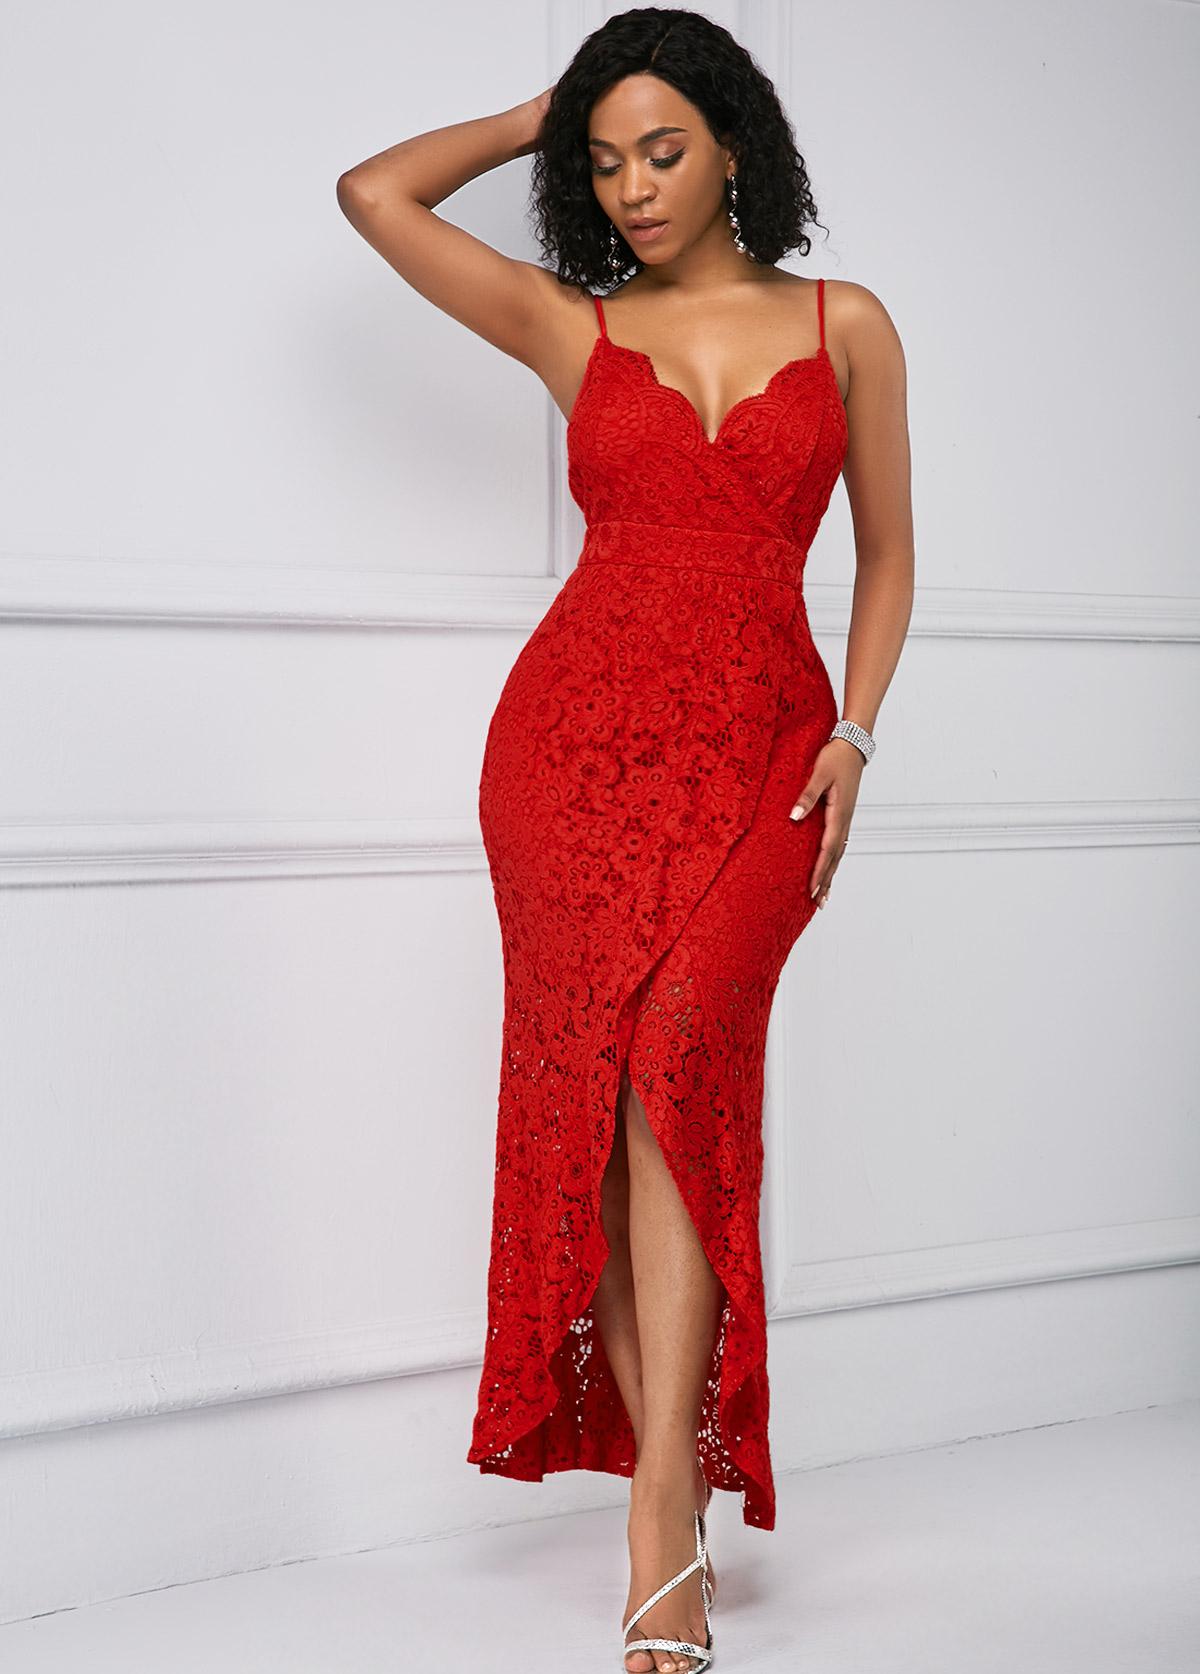 ROTITA High Split Red Lace Panel Spaghetti Straps Dress